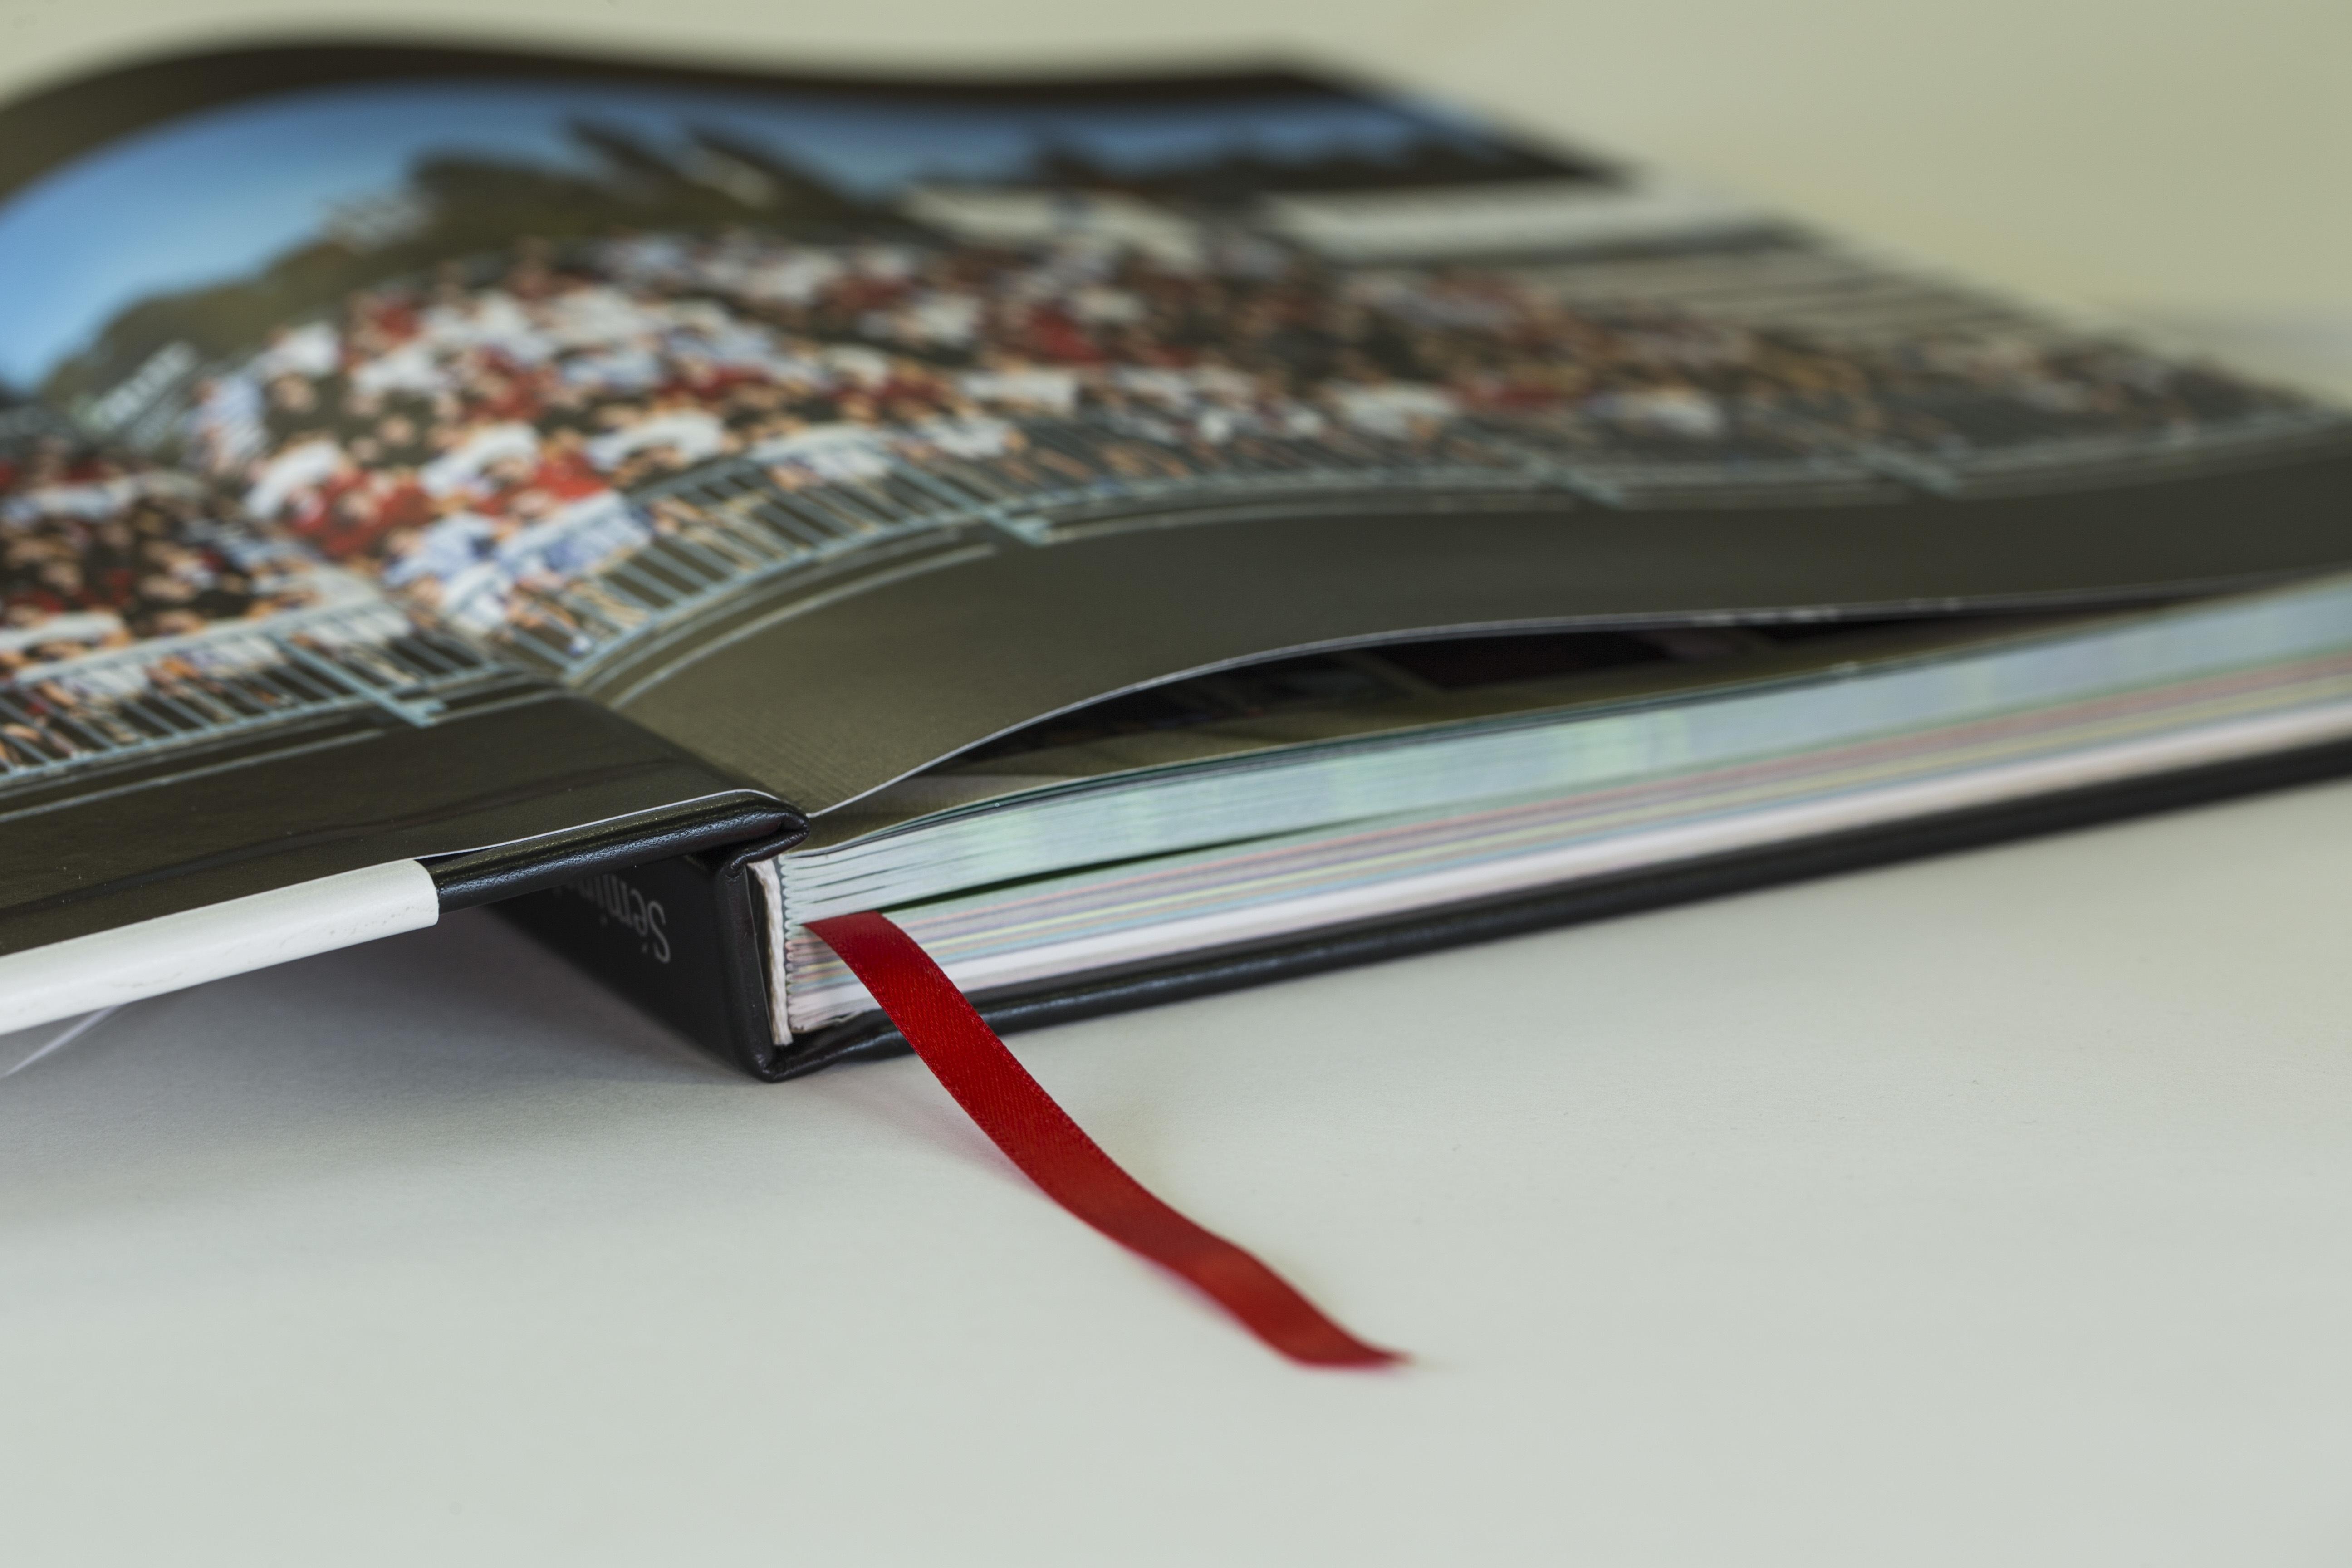 made fresh binding offers - HD1920×1280